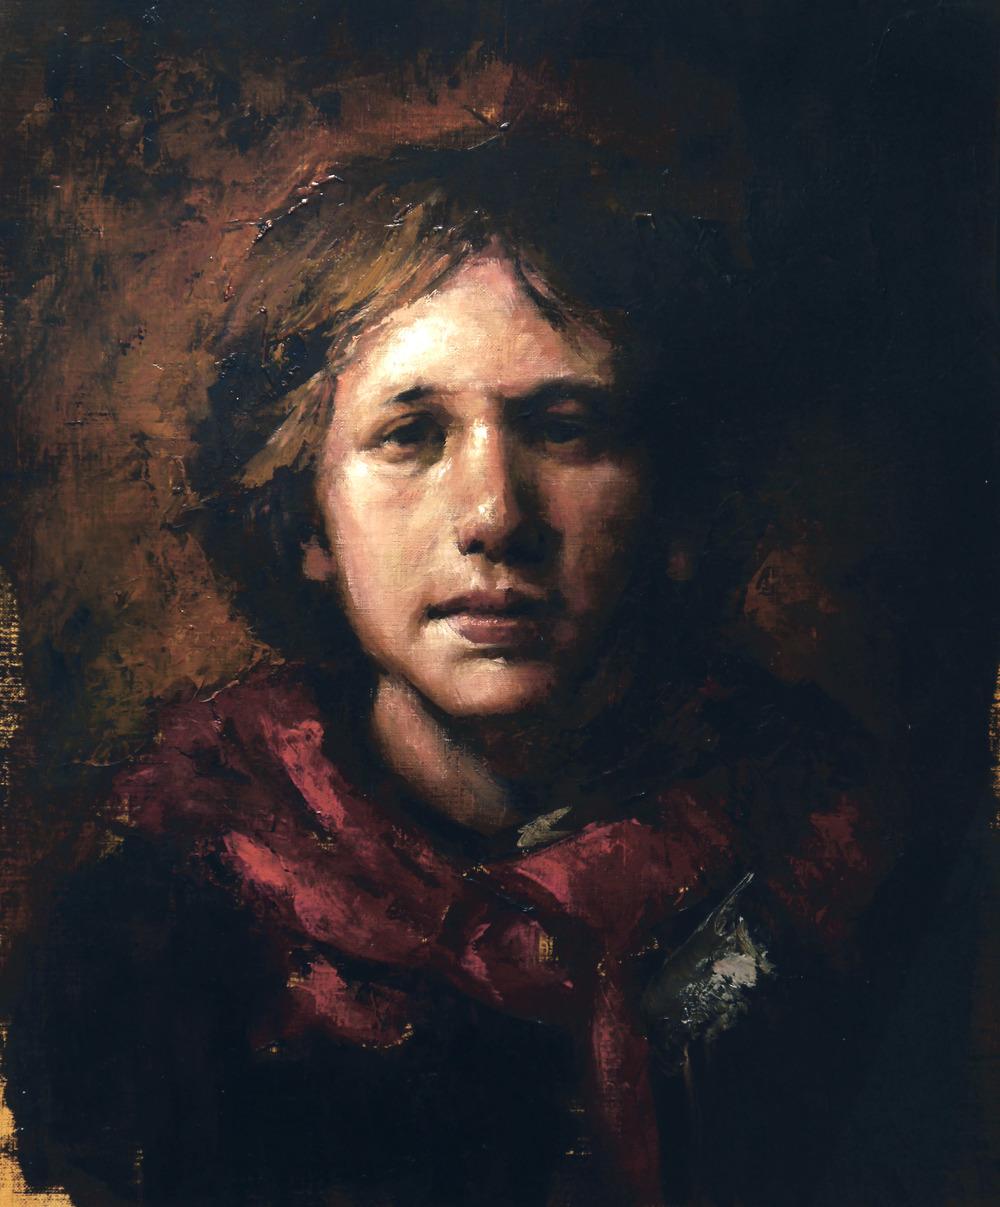 Copy of Odd Nerdrum Self-portrait